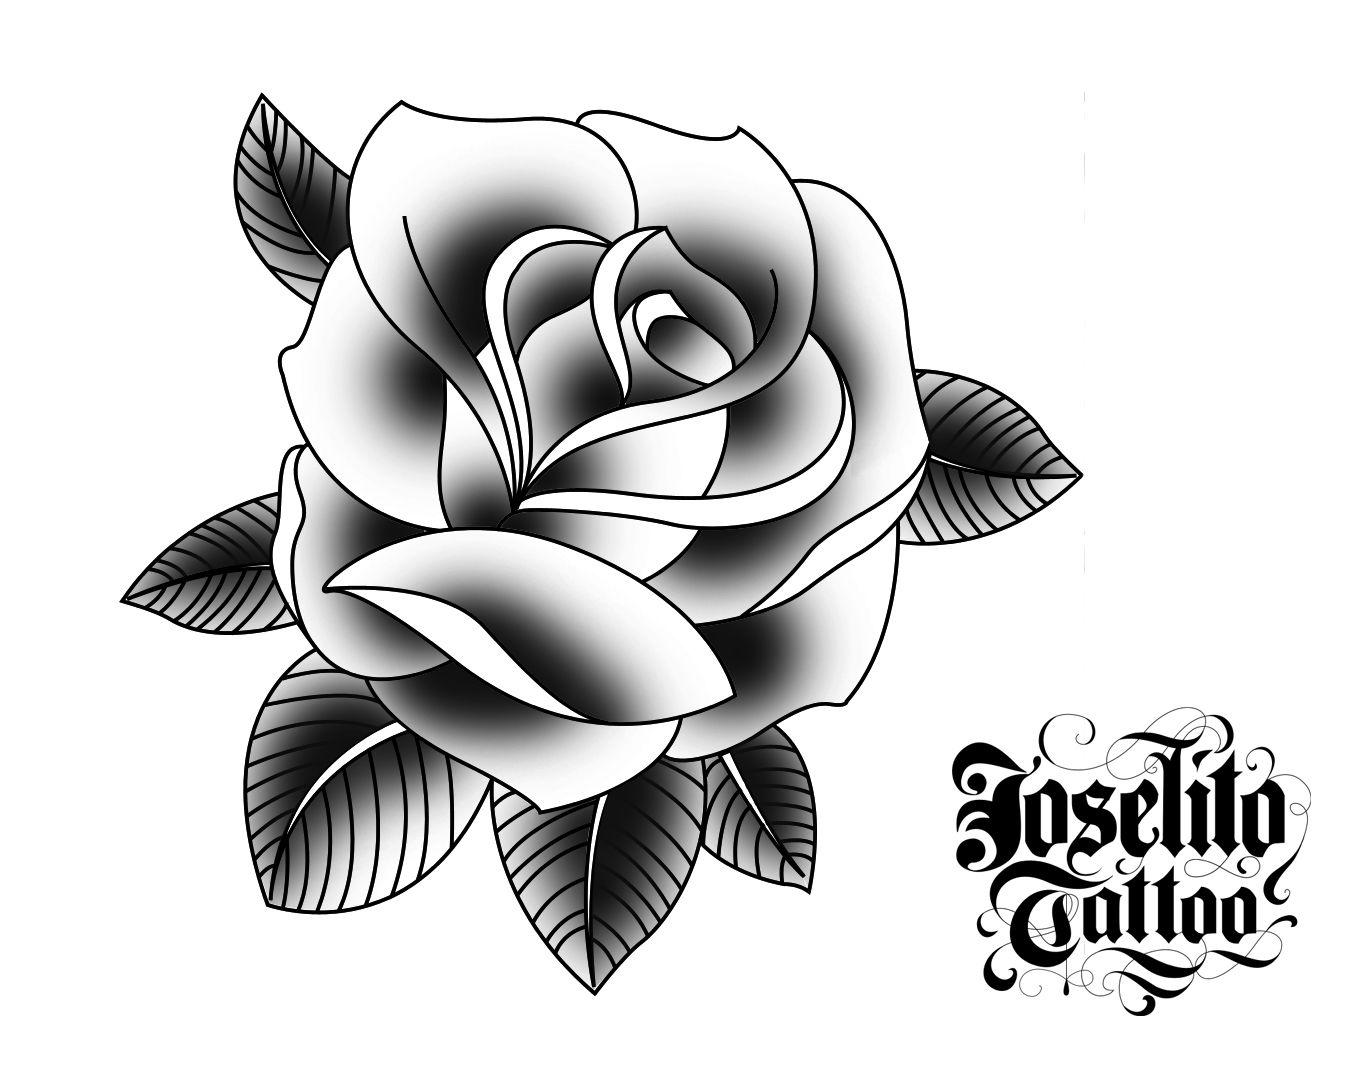 Rosetattoo Tatuaje Rosa Diseno Rosa Rose Design Tatuajes De Rosas Dibujos De Rosas Tatuajes De Relojes